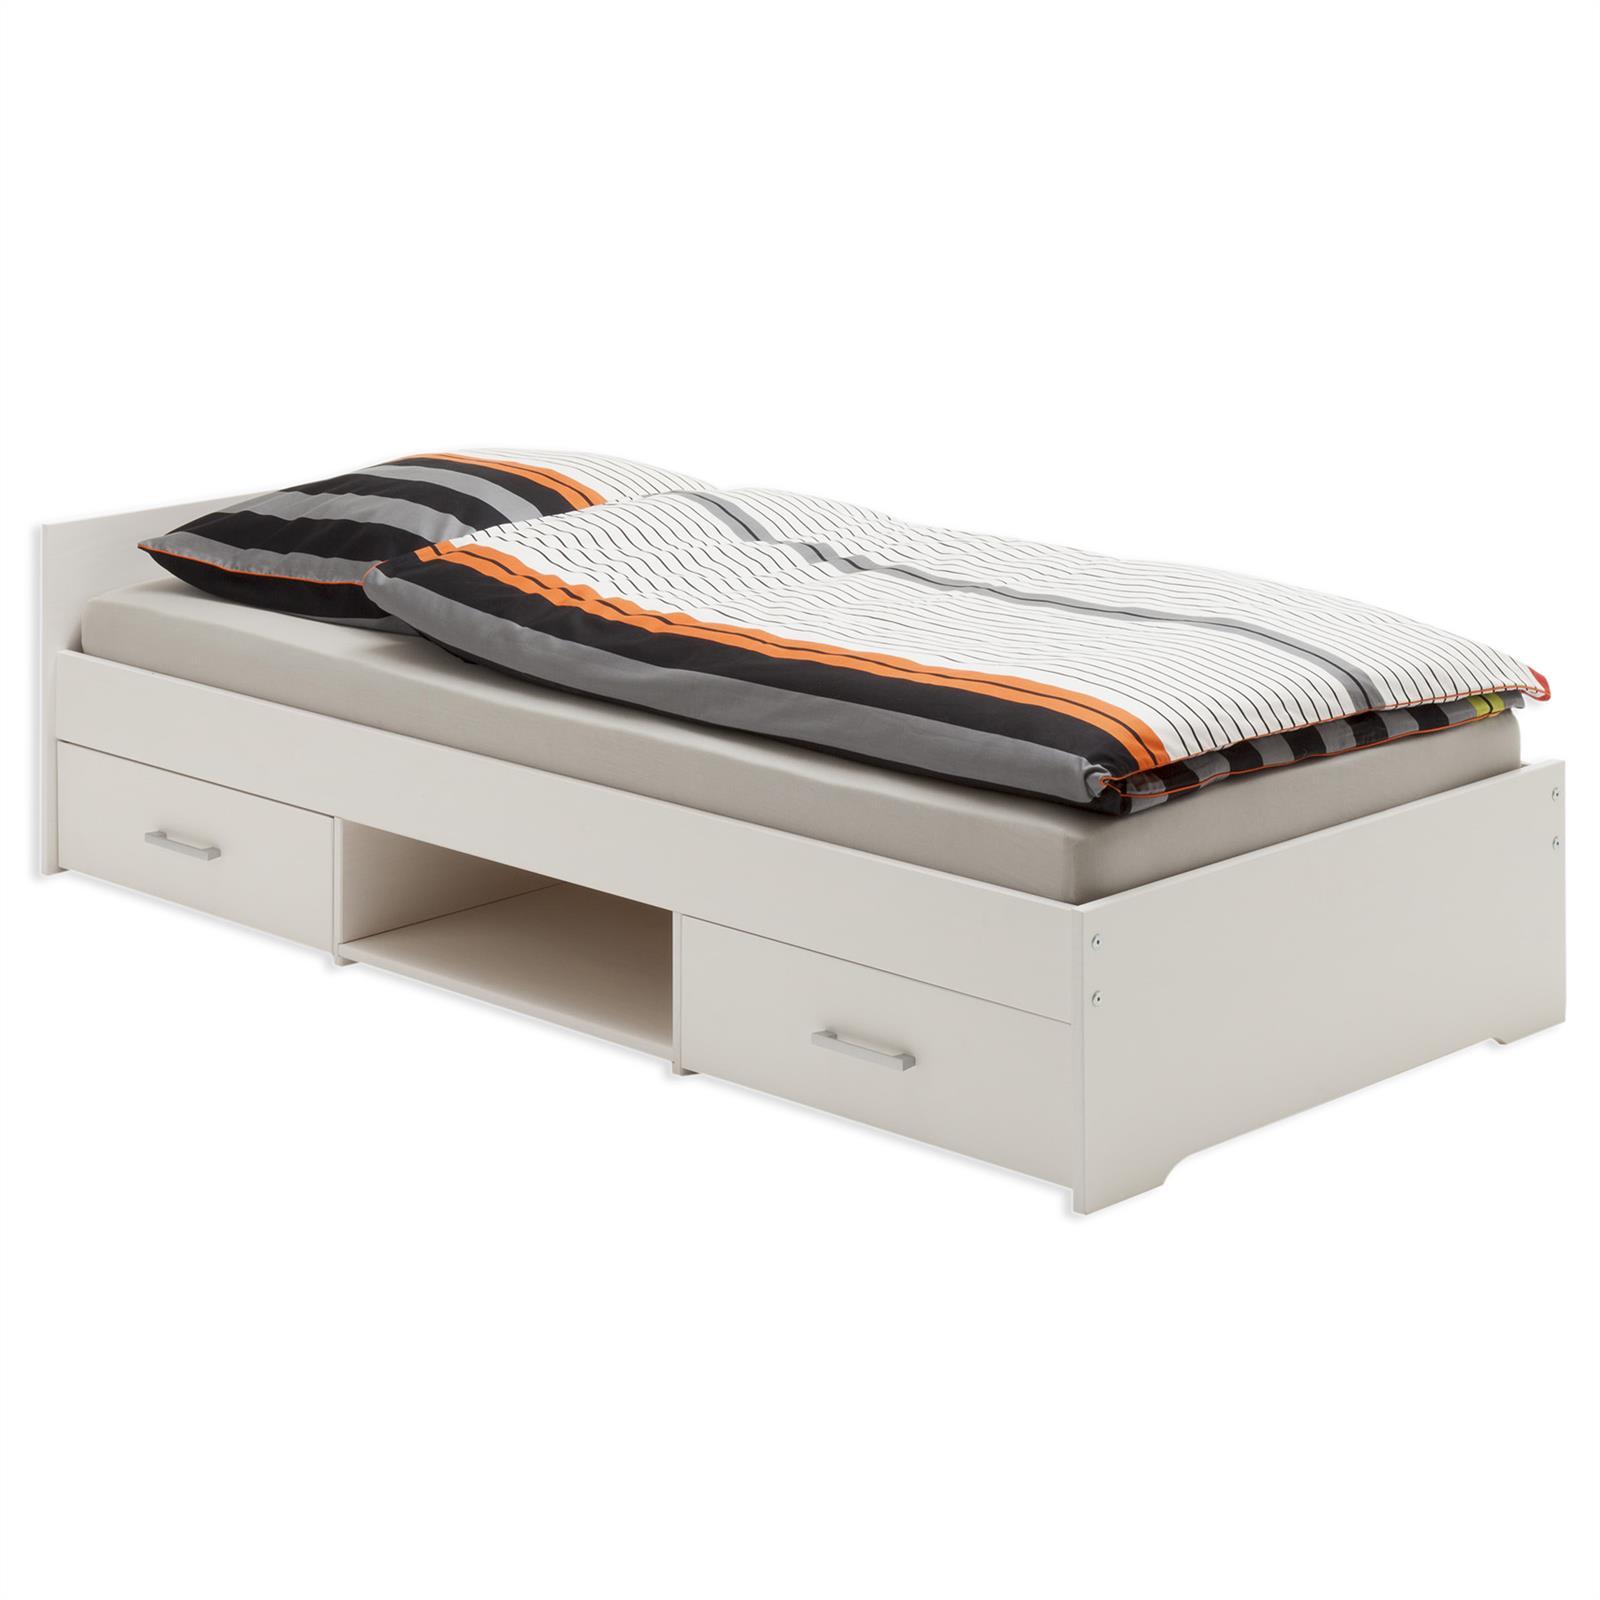 einzelbett kai weiss lackiert 90 x 200 cm mobilia24. Black Bedroom Furniture Sets. Home Design Ideas